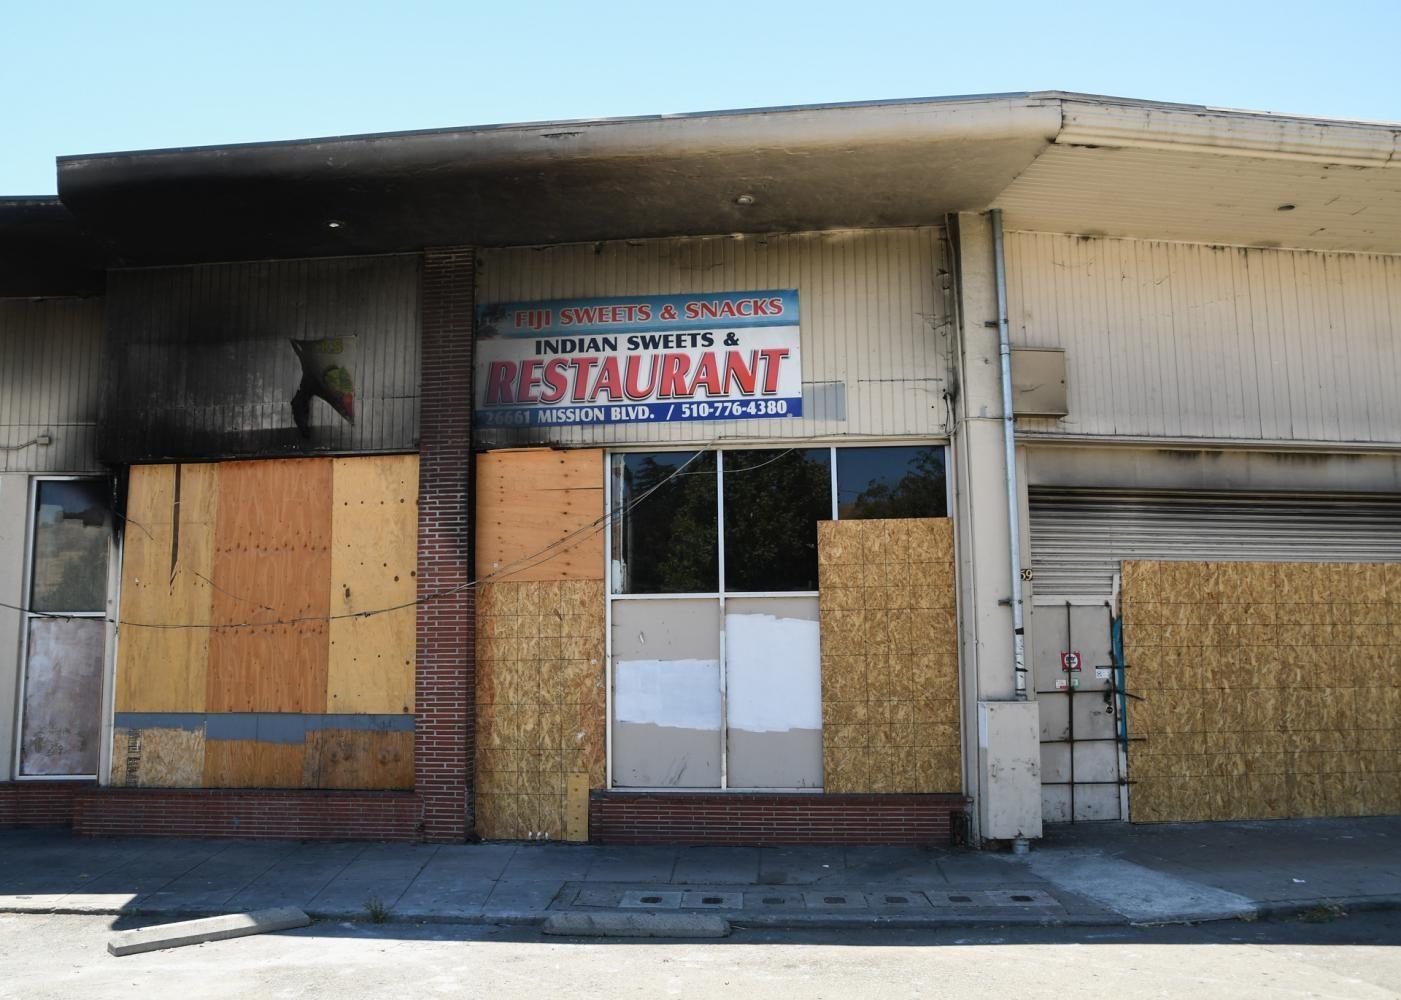 Hayward+strip+mall+destroyed+by+fire%2C+vandals